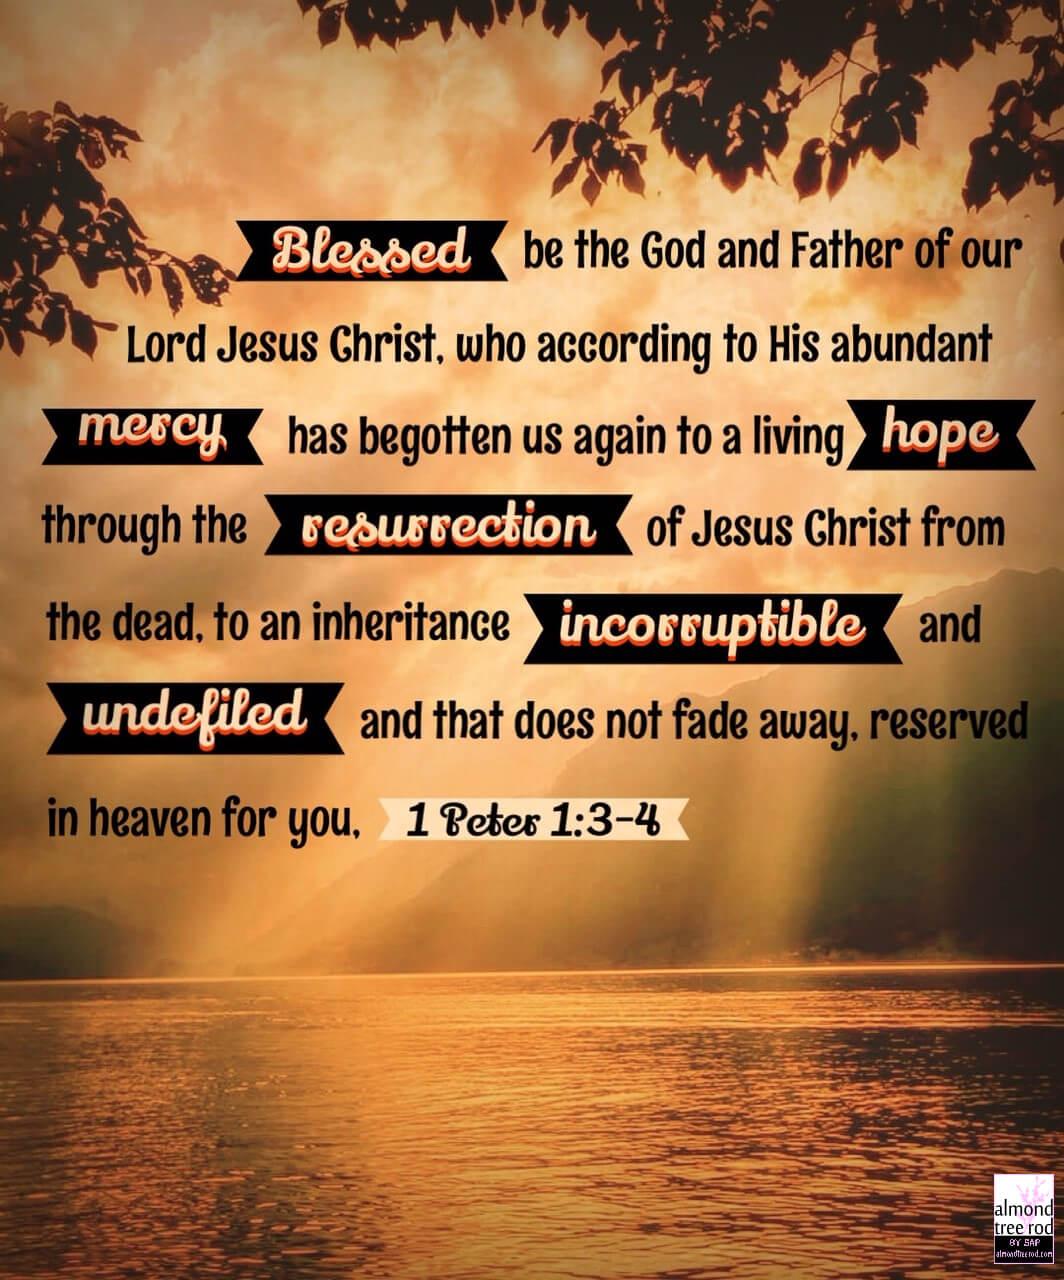 1 Peter 1:3-4